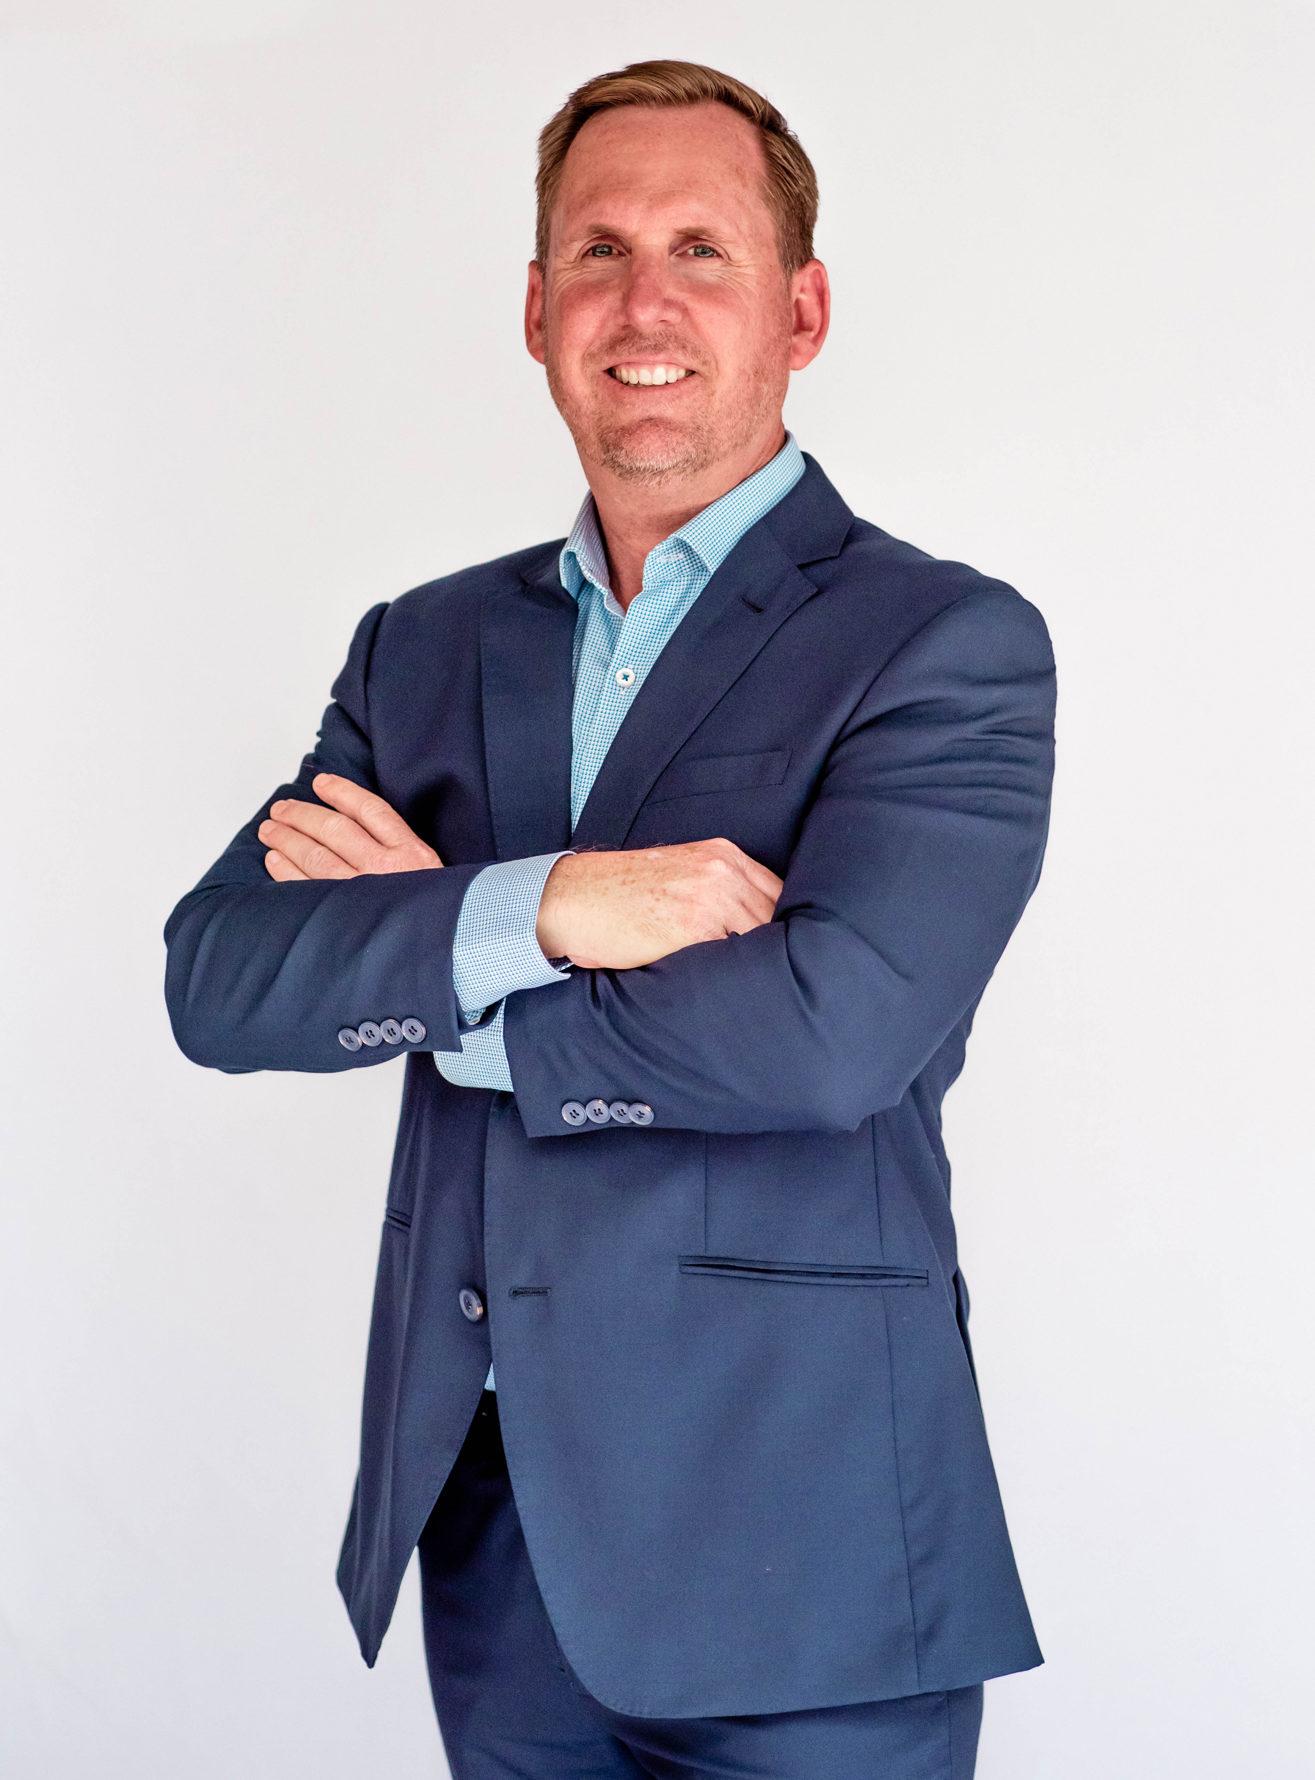 Brendan Newell